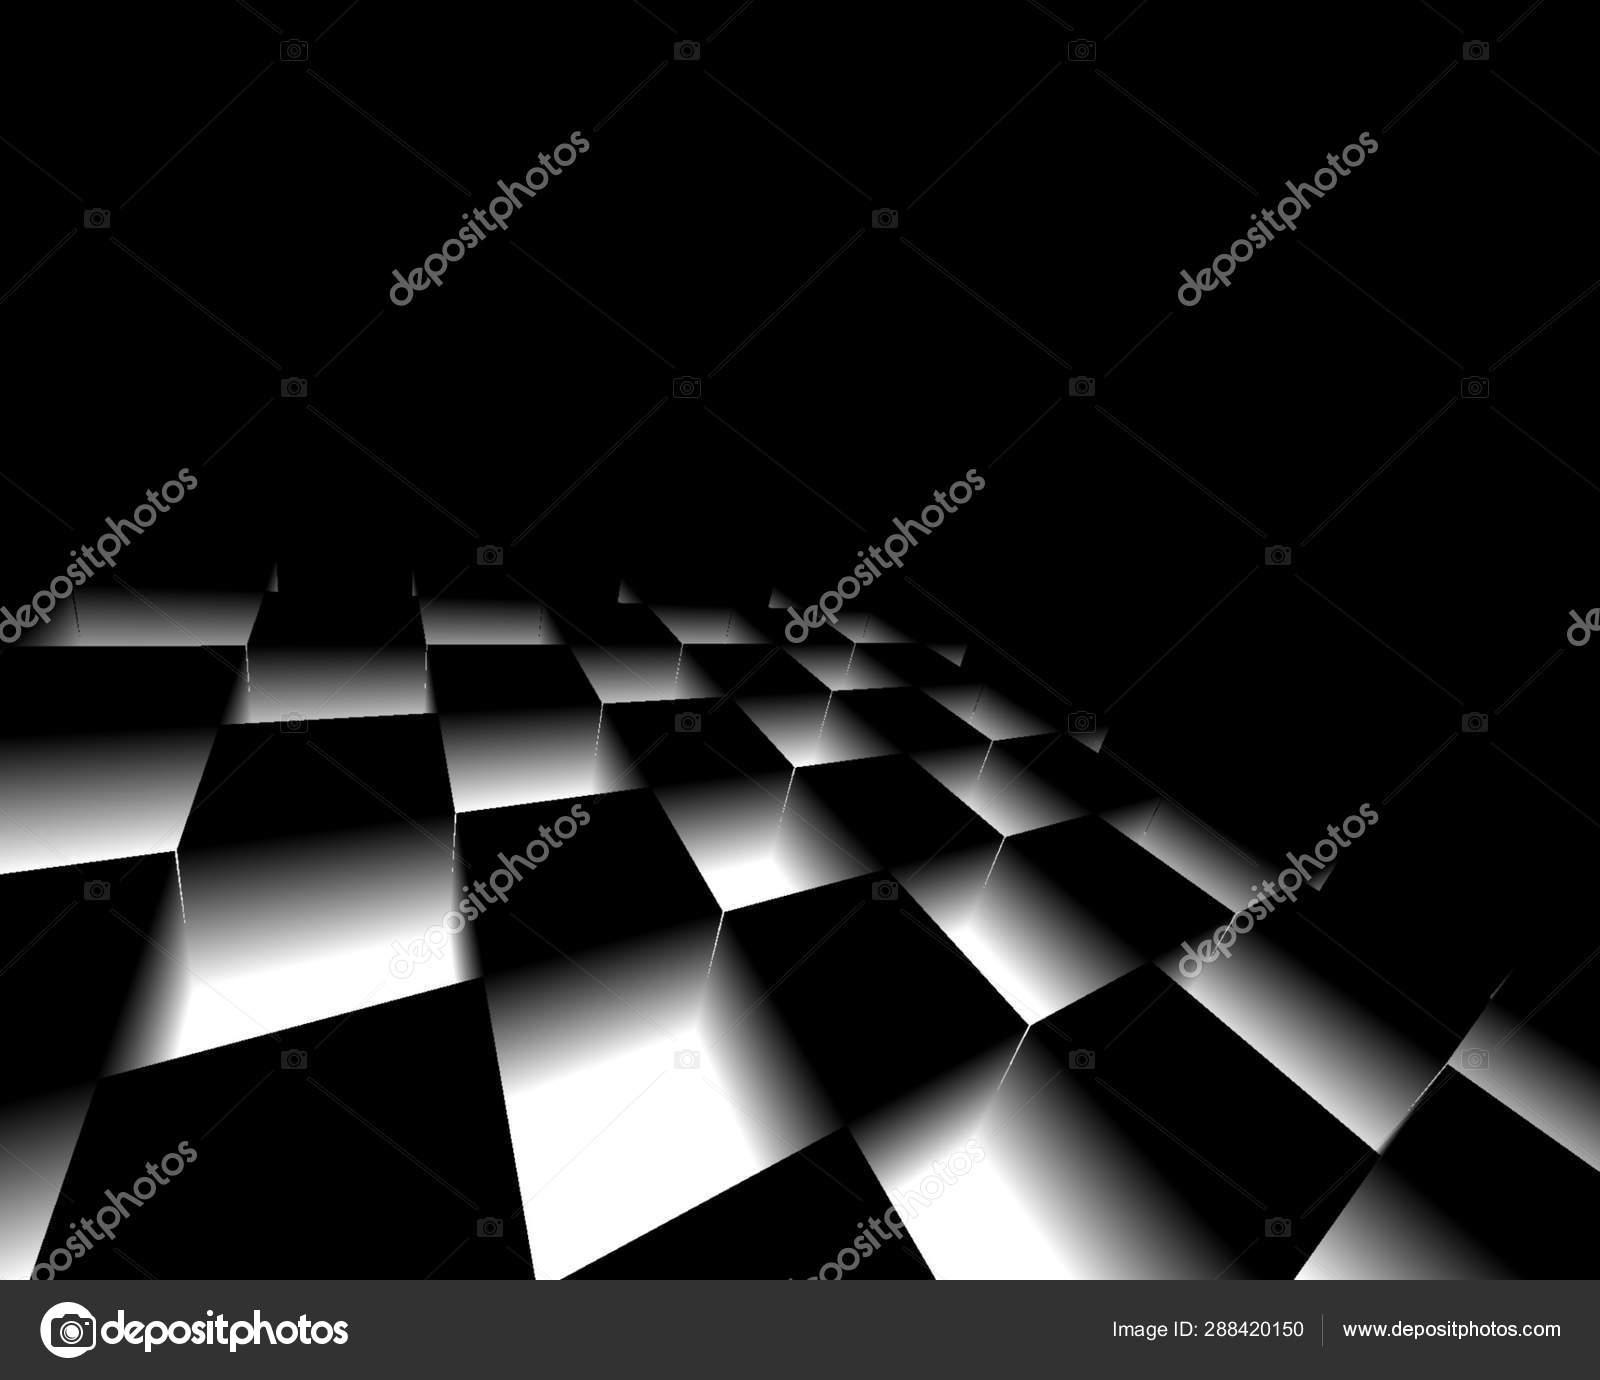 Black White Abstract Background Desktop Wallpaper Website Design Template Copy Stock Photo C Tza X Hotmail Com 288420150